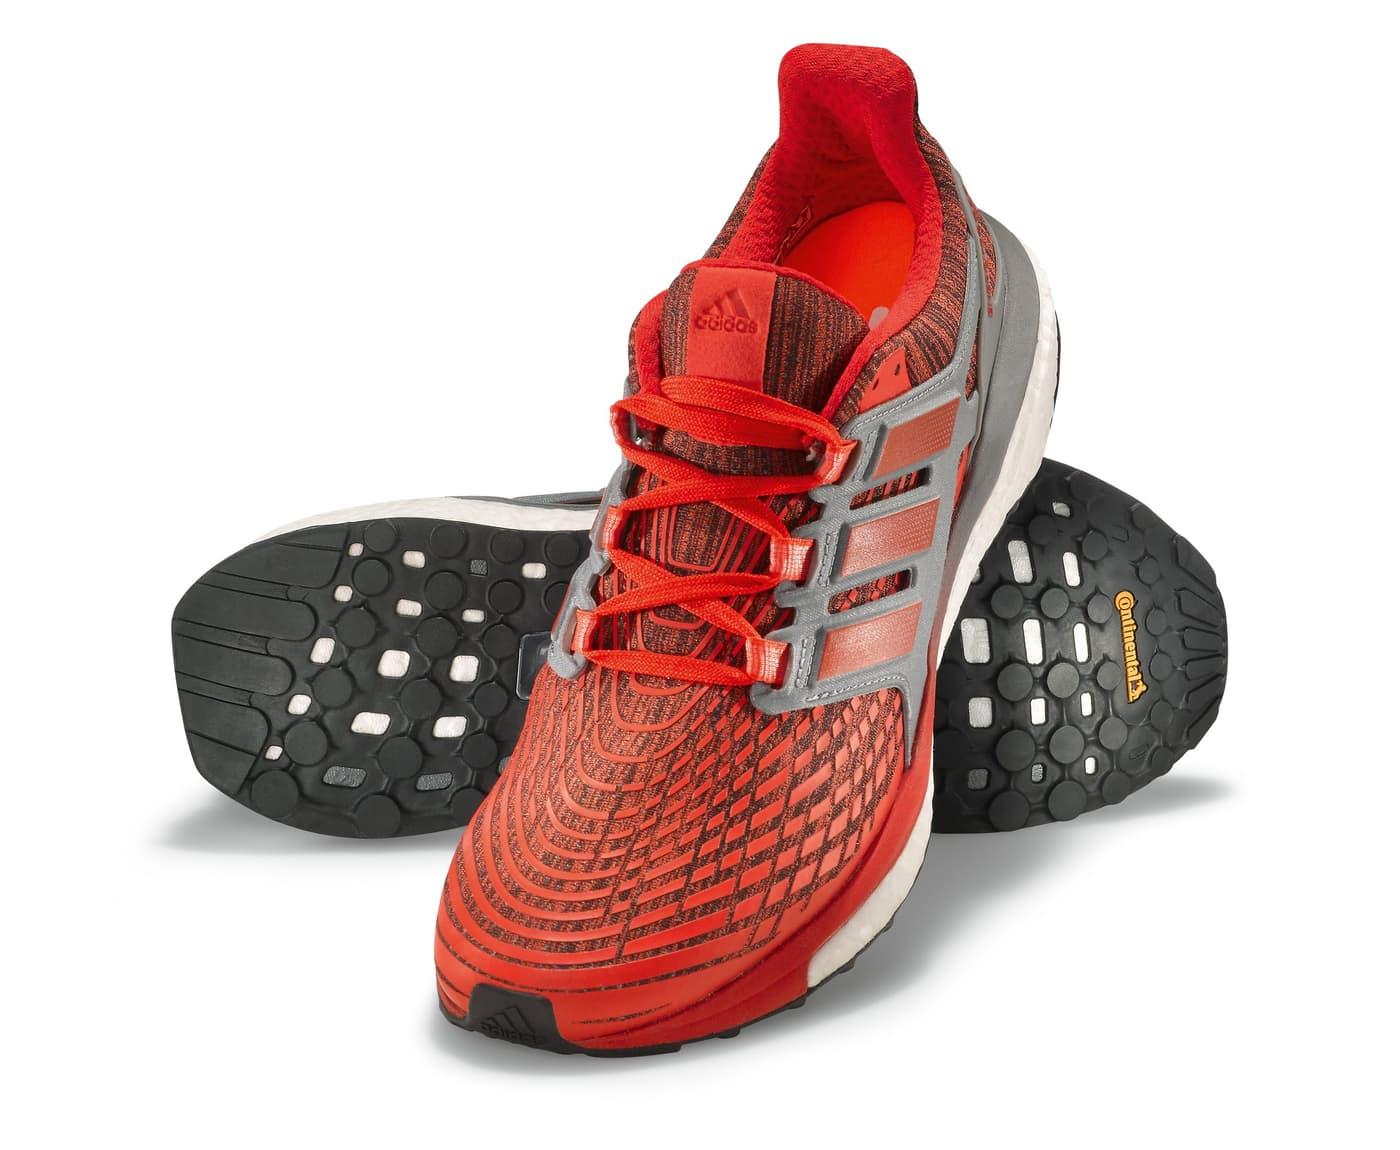 wholesale dealer 719b9 e91d8 Uomo Adidas 4 Scarpa Da Energy Migros Running Boost HzzTC